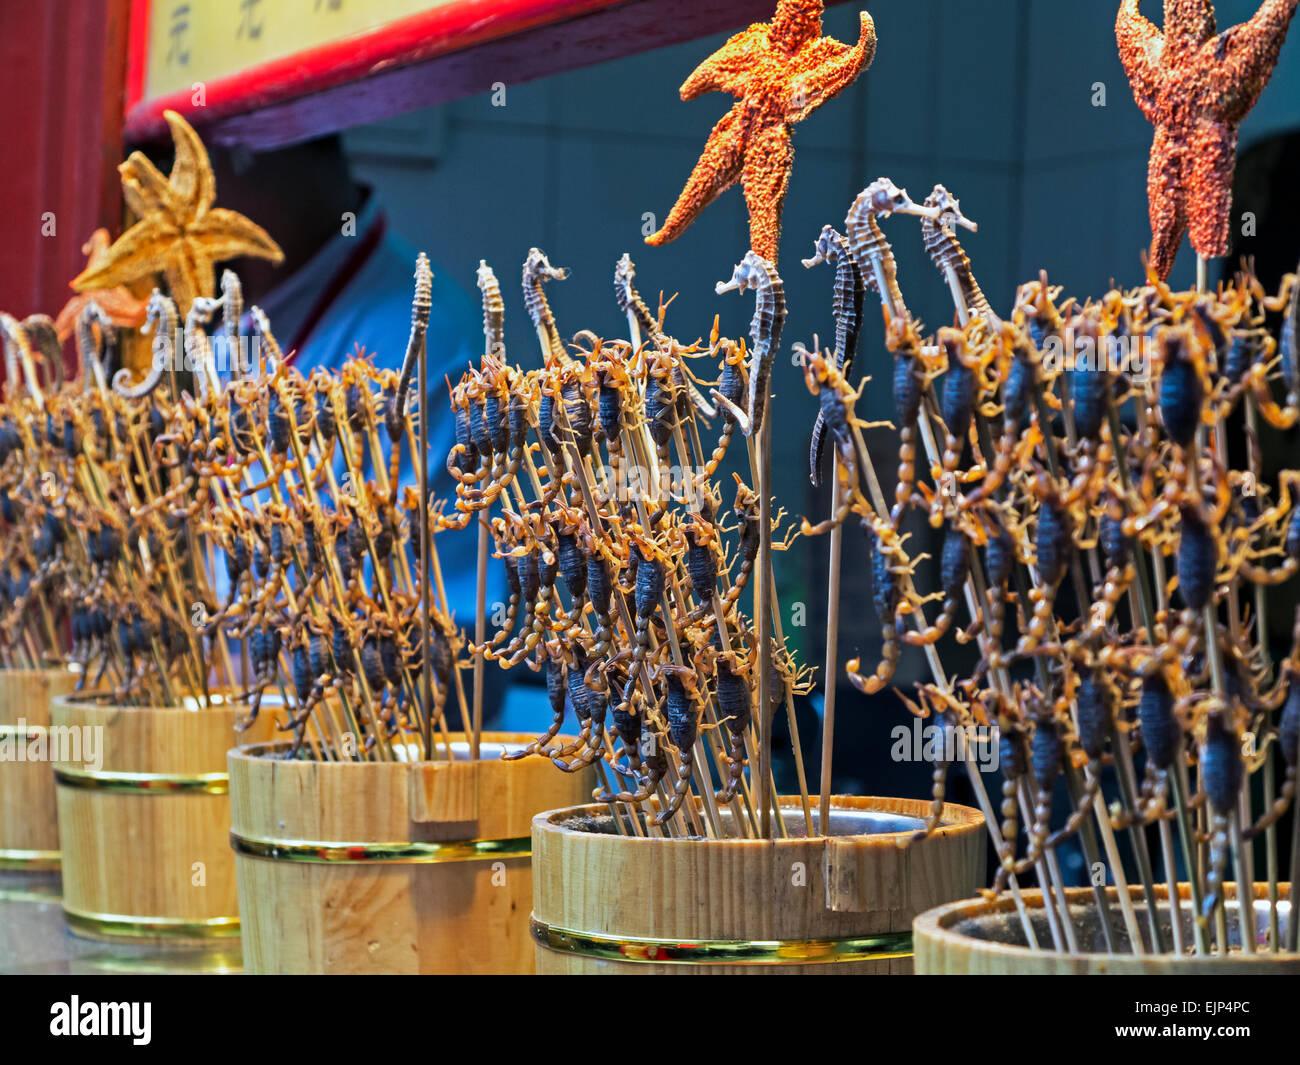 China, Beijing, scorpions and starfish on skewers, Wangfujing street night market - Stock Image